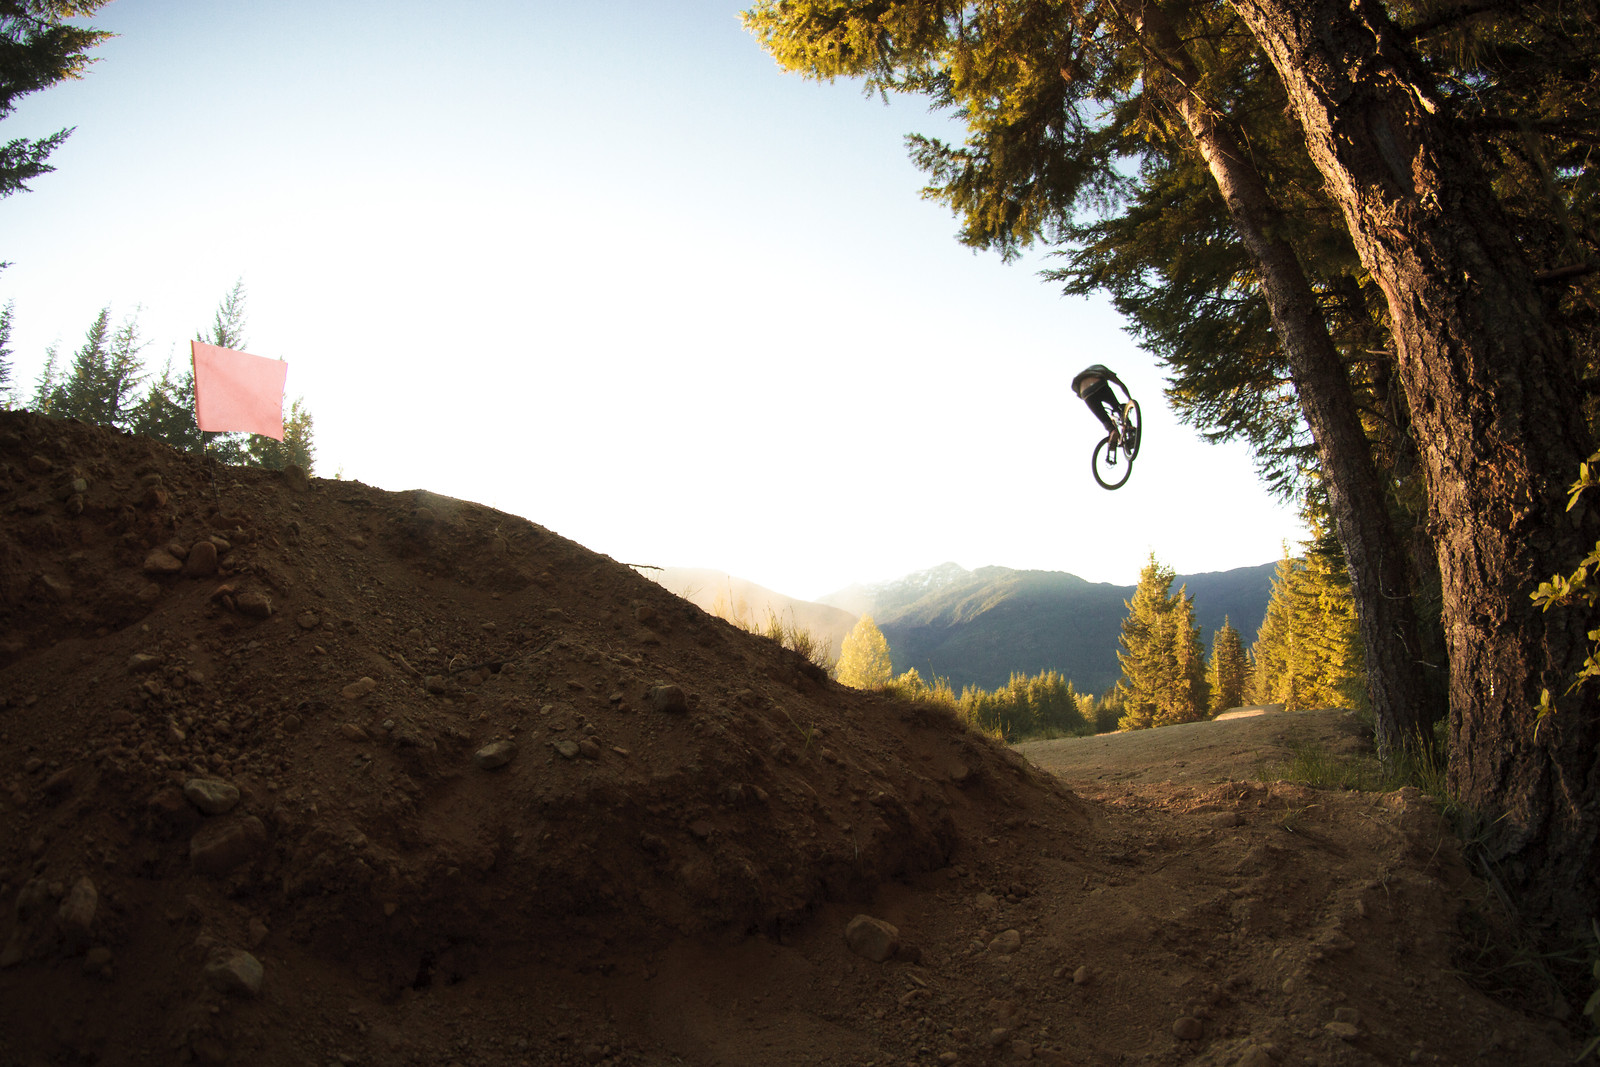 Go gets sideways! - jamieledson - Mountain Biking Pictures - Vital MTB